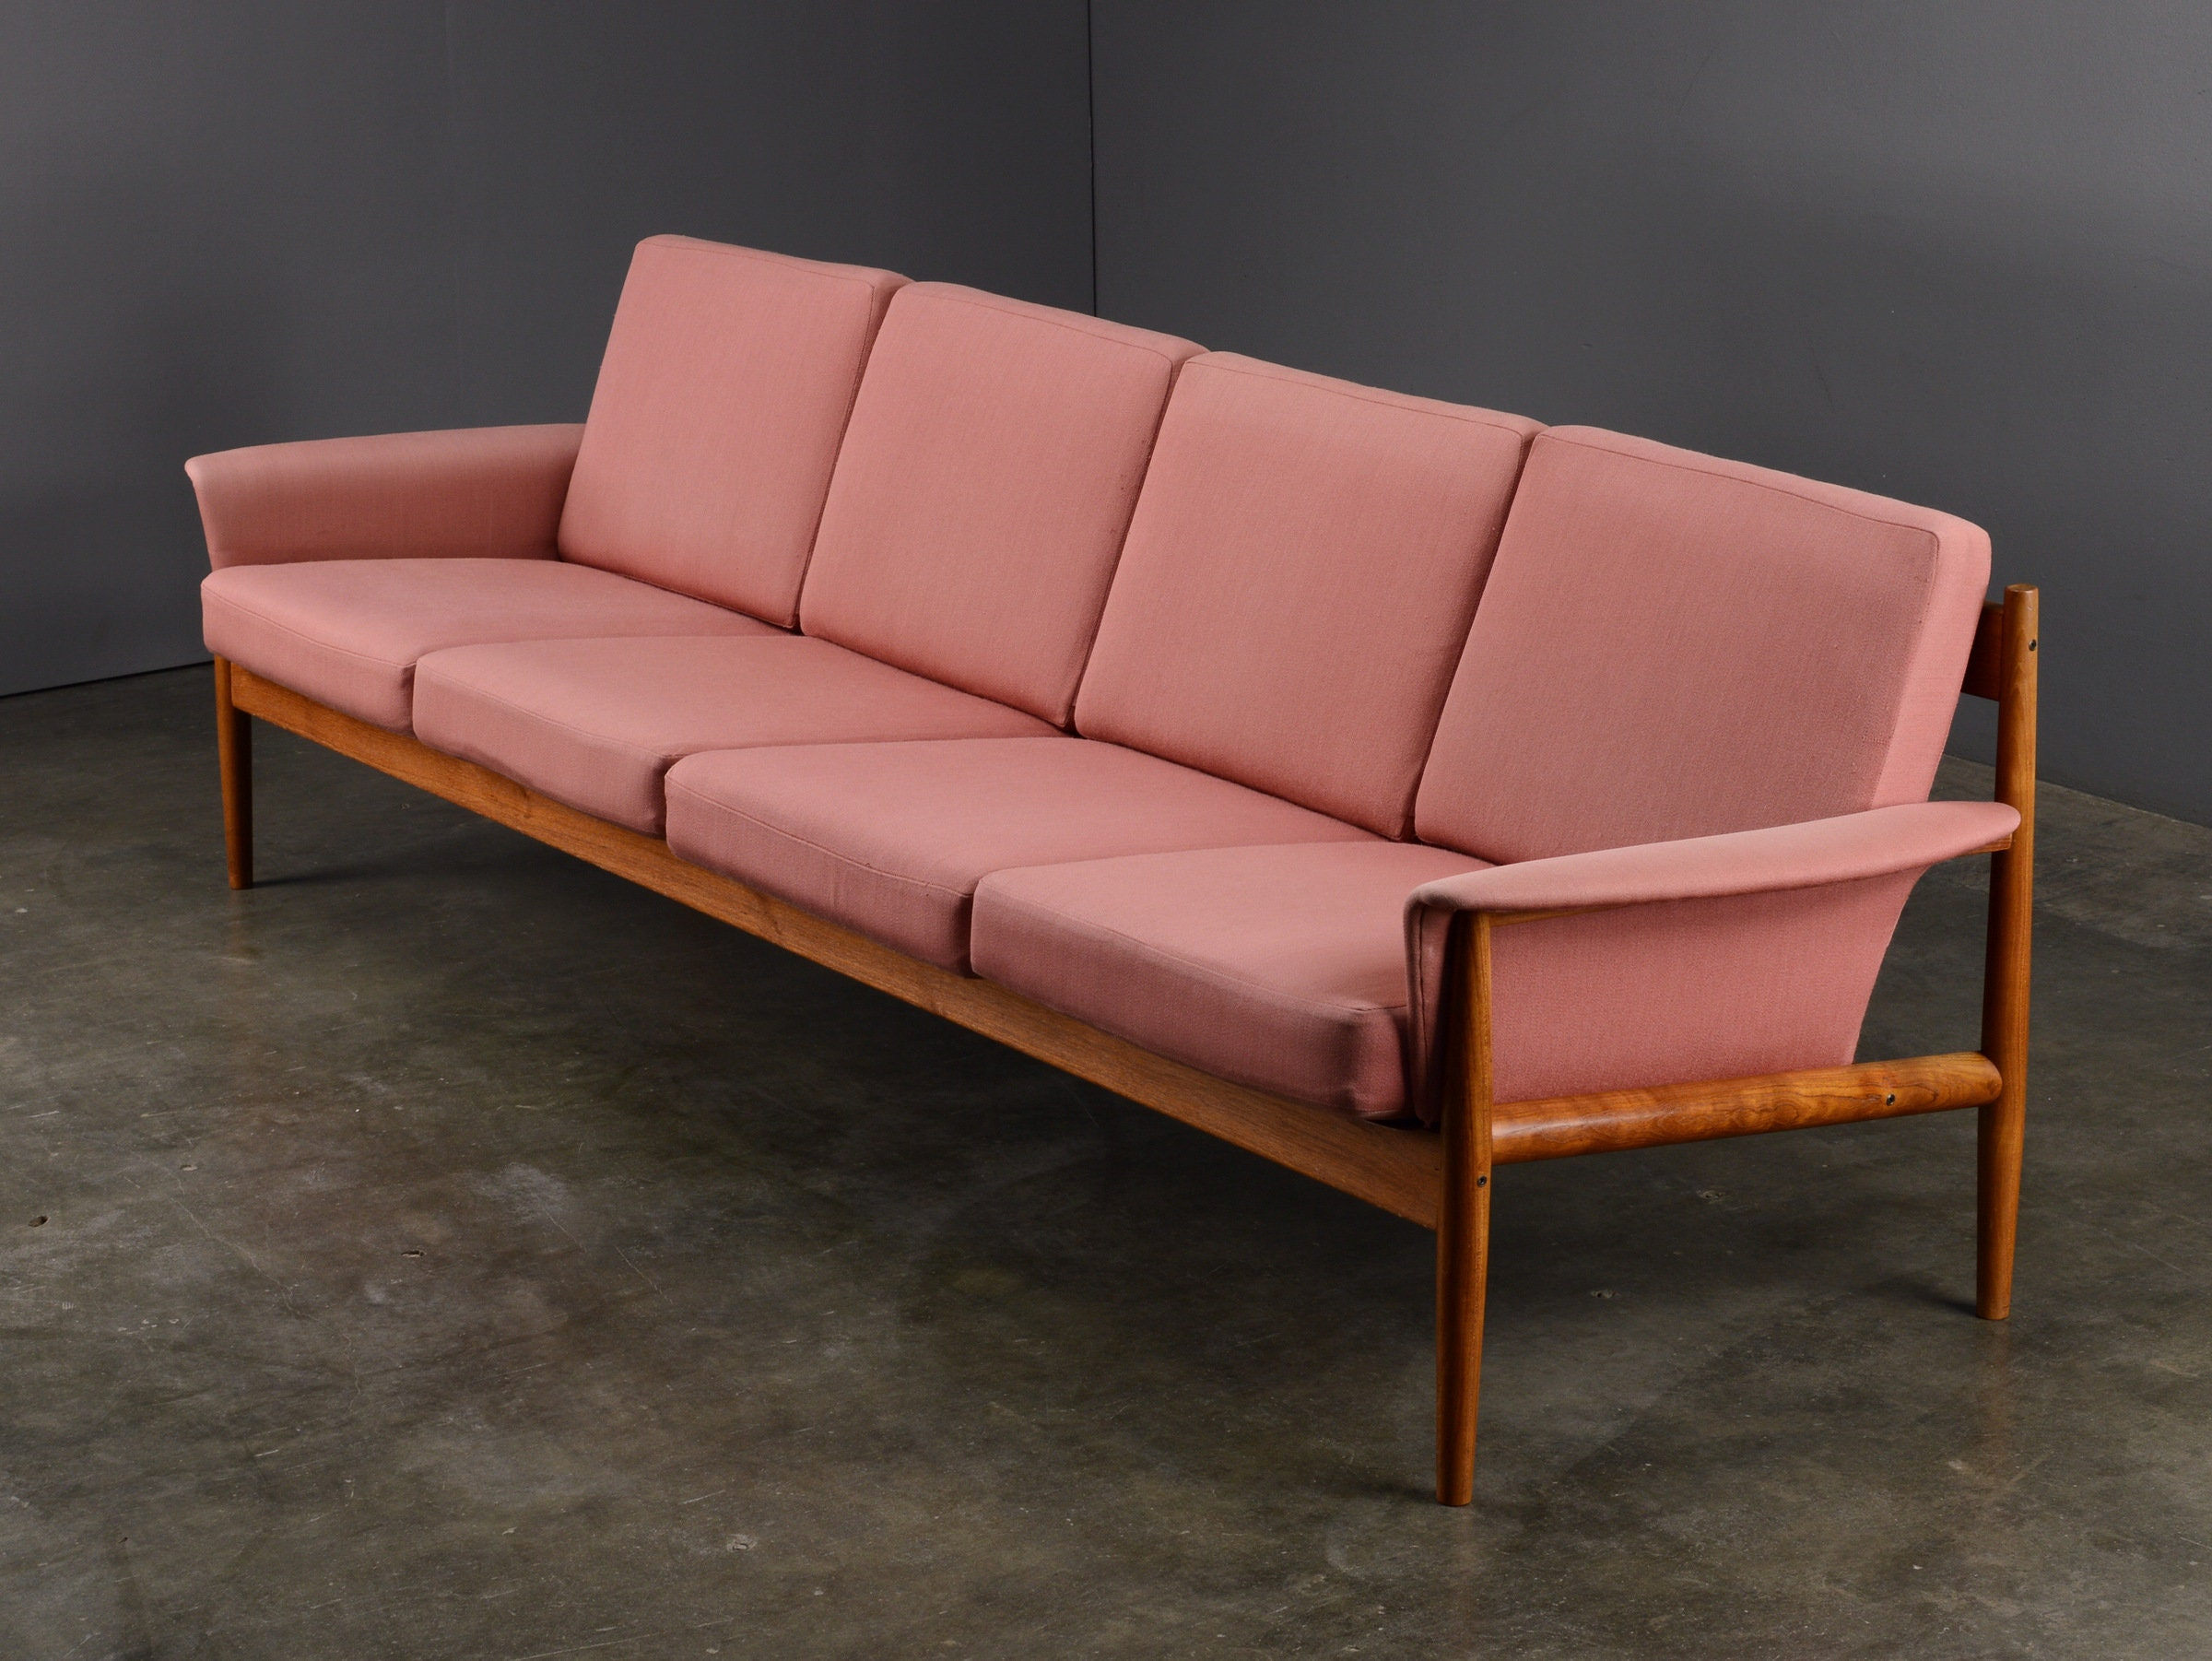 8ft Mid Century Sofa Grete Jalk France And Son Danish Modern Teak Pink